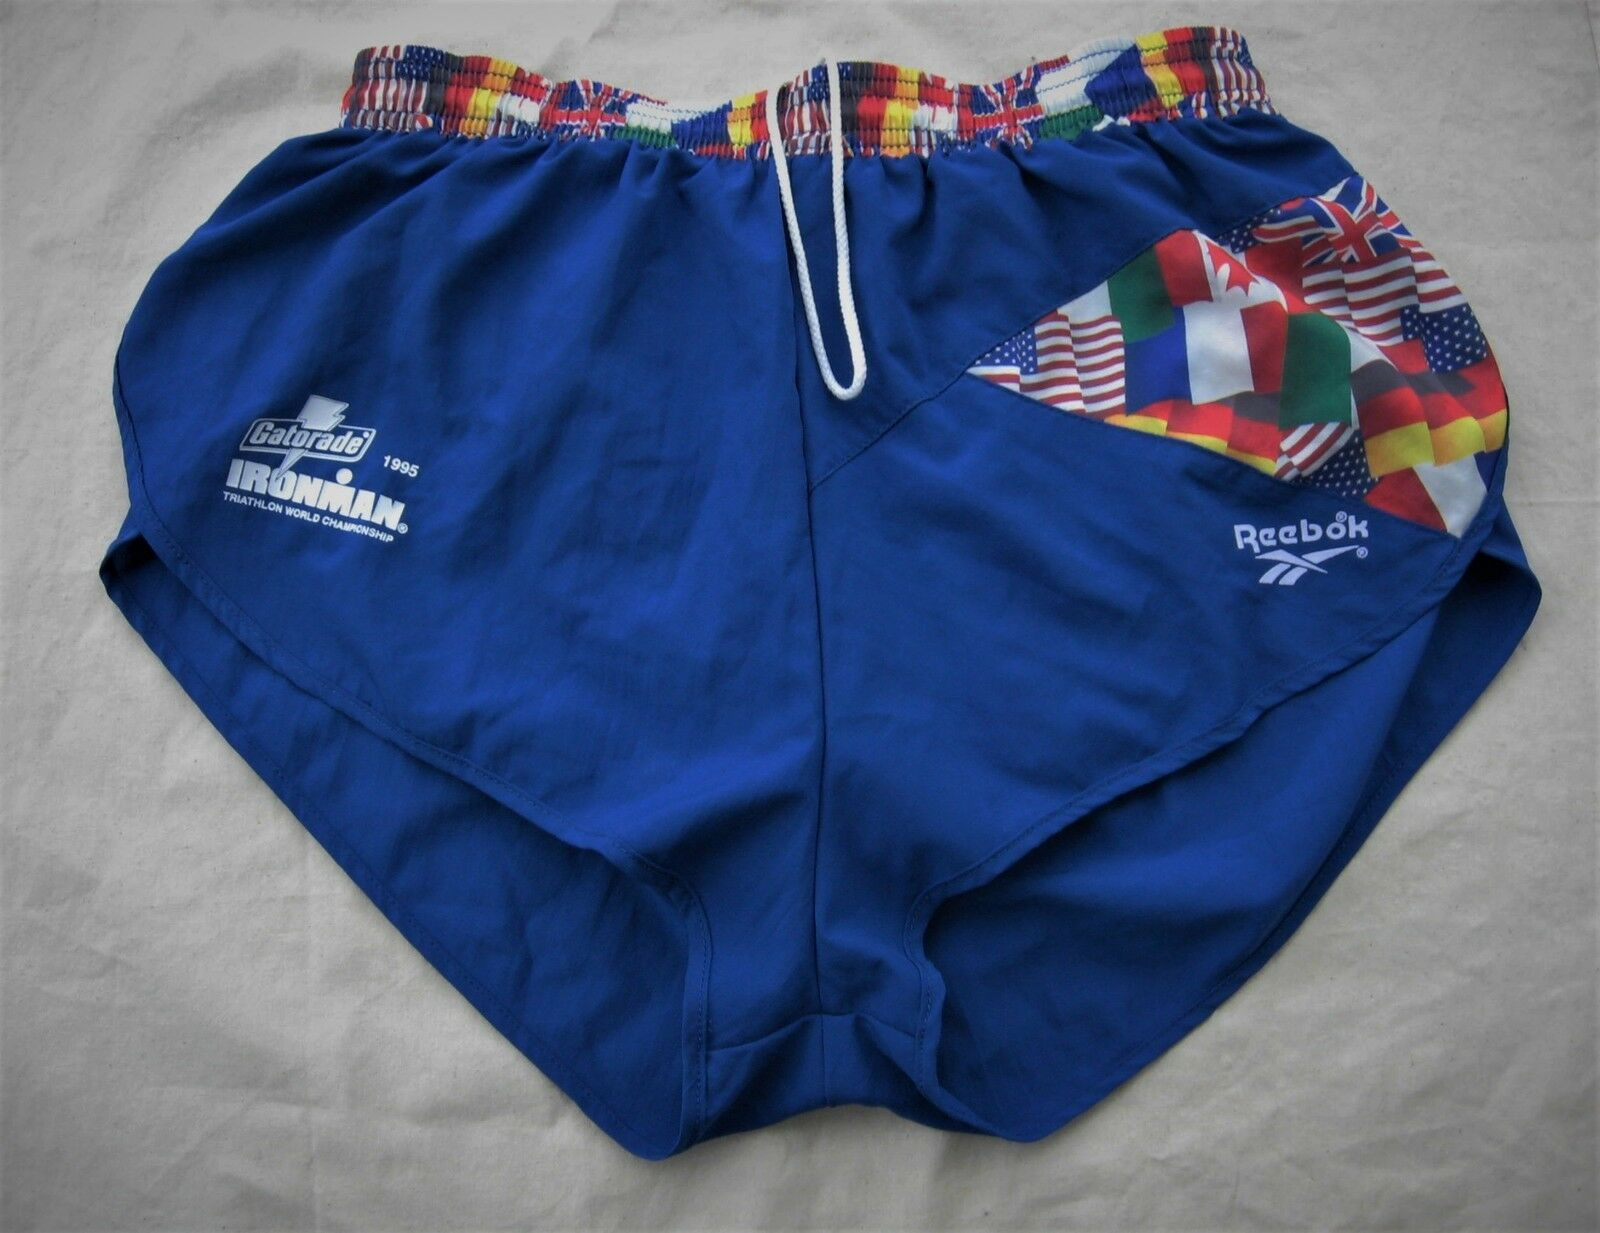 Vintage reebok shorts ironman triathlon World Championship 1995 Gatorade  running  barato